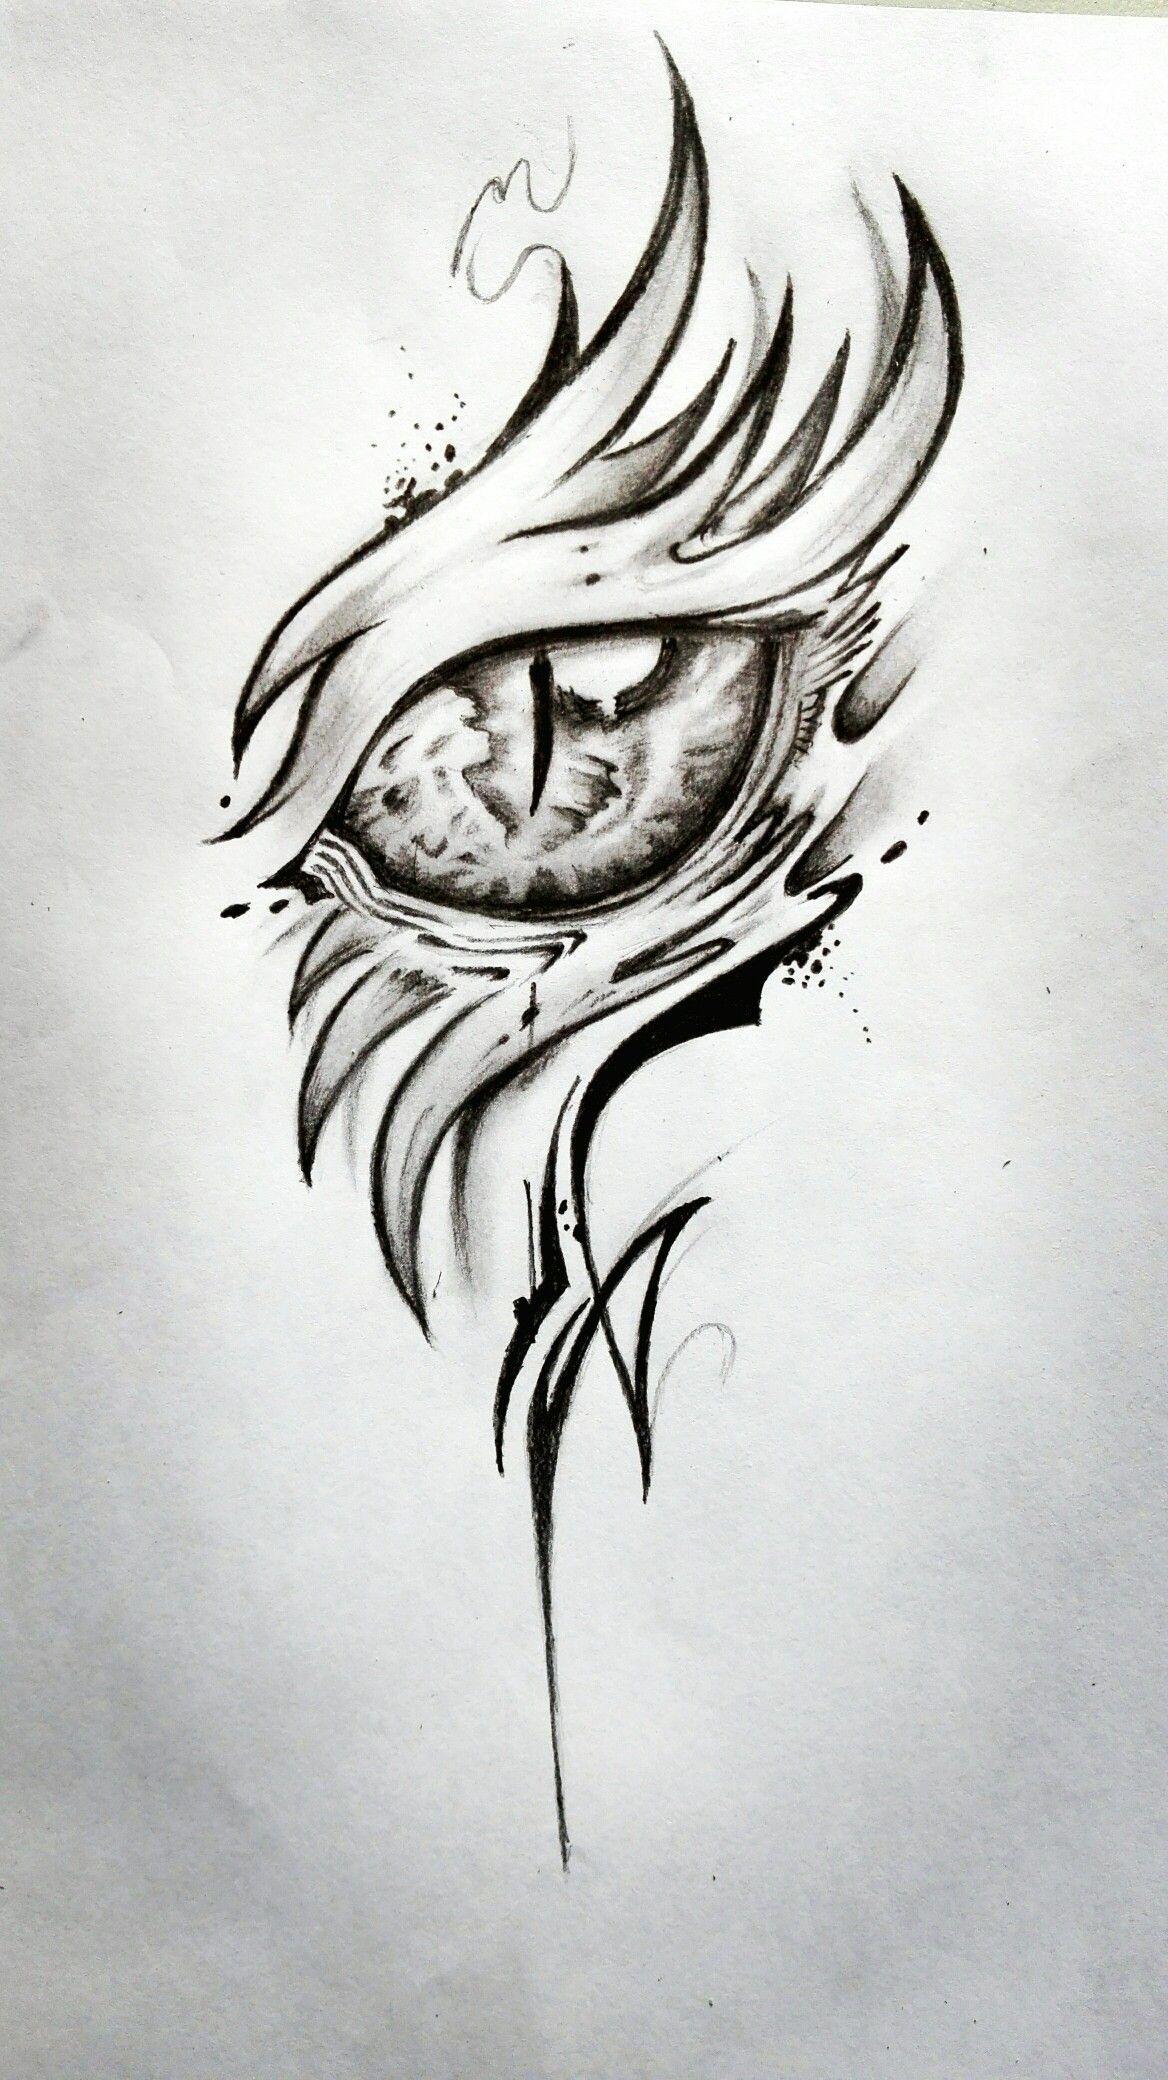 О господи, как это круто *°* Dragon eye drawing, Eye